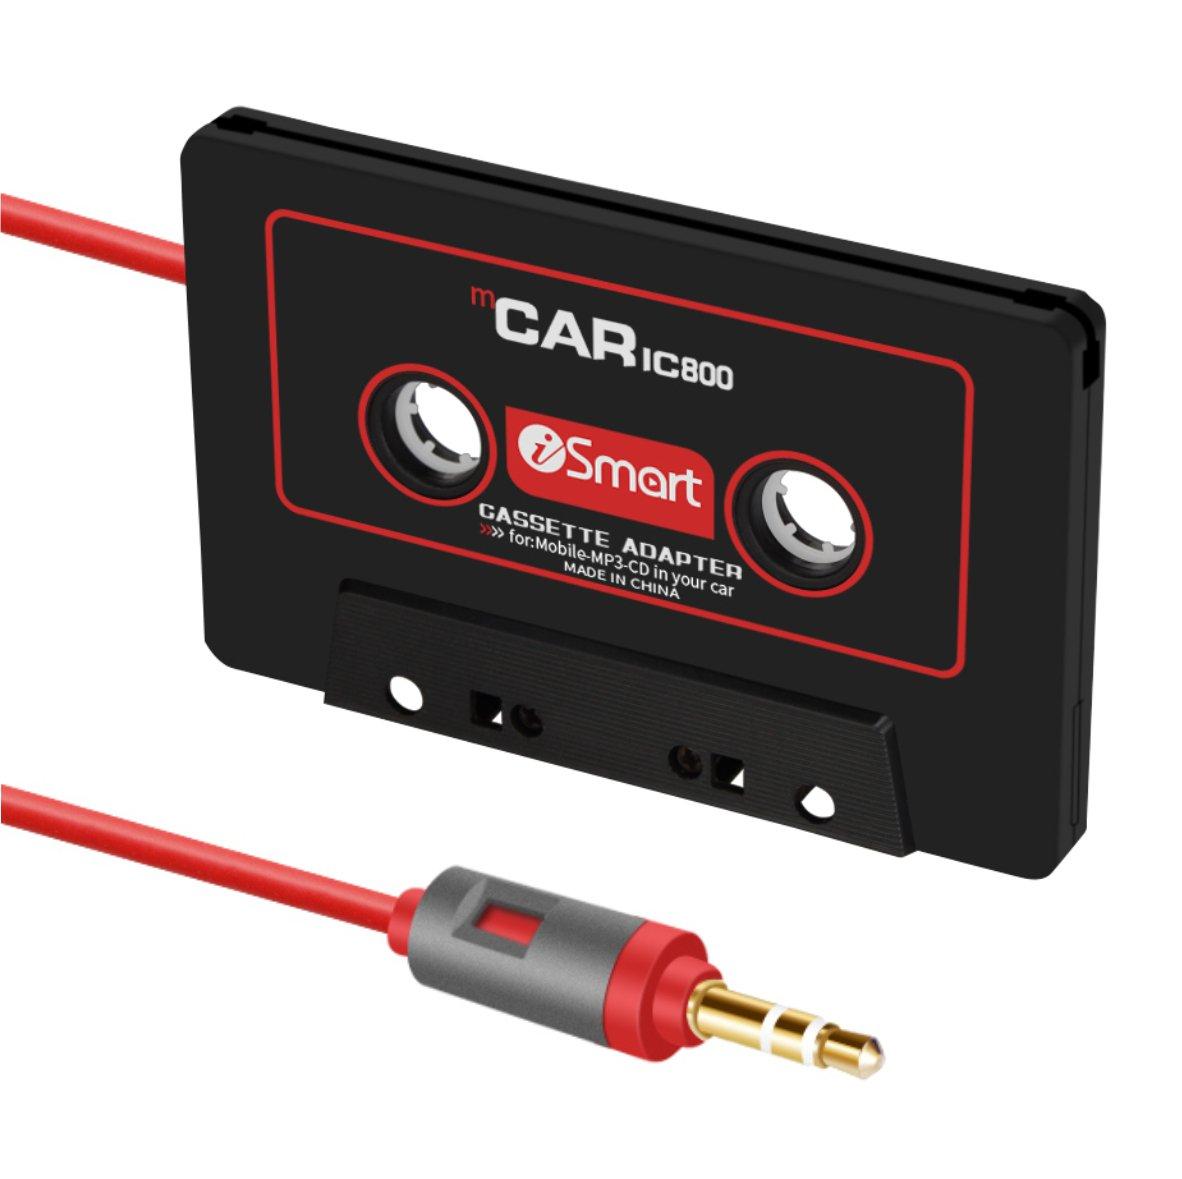 autoec Auto Audio Tape Kassette Adapter fü r iPhone iPad iPod MP3 Player CD-Radio Nano, 3 m Lang Kabel 3,5 mm, Reisen Kassette Adapter fü r Autos –  Schwarz